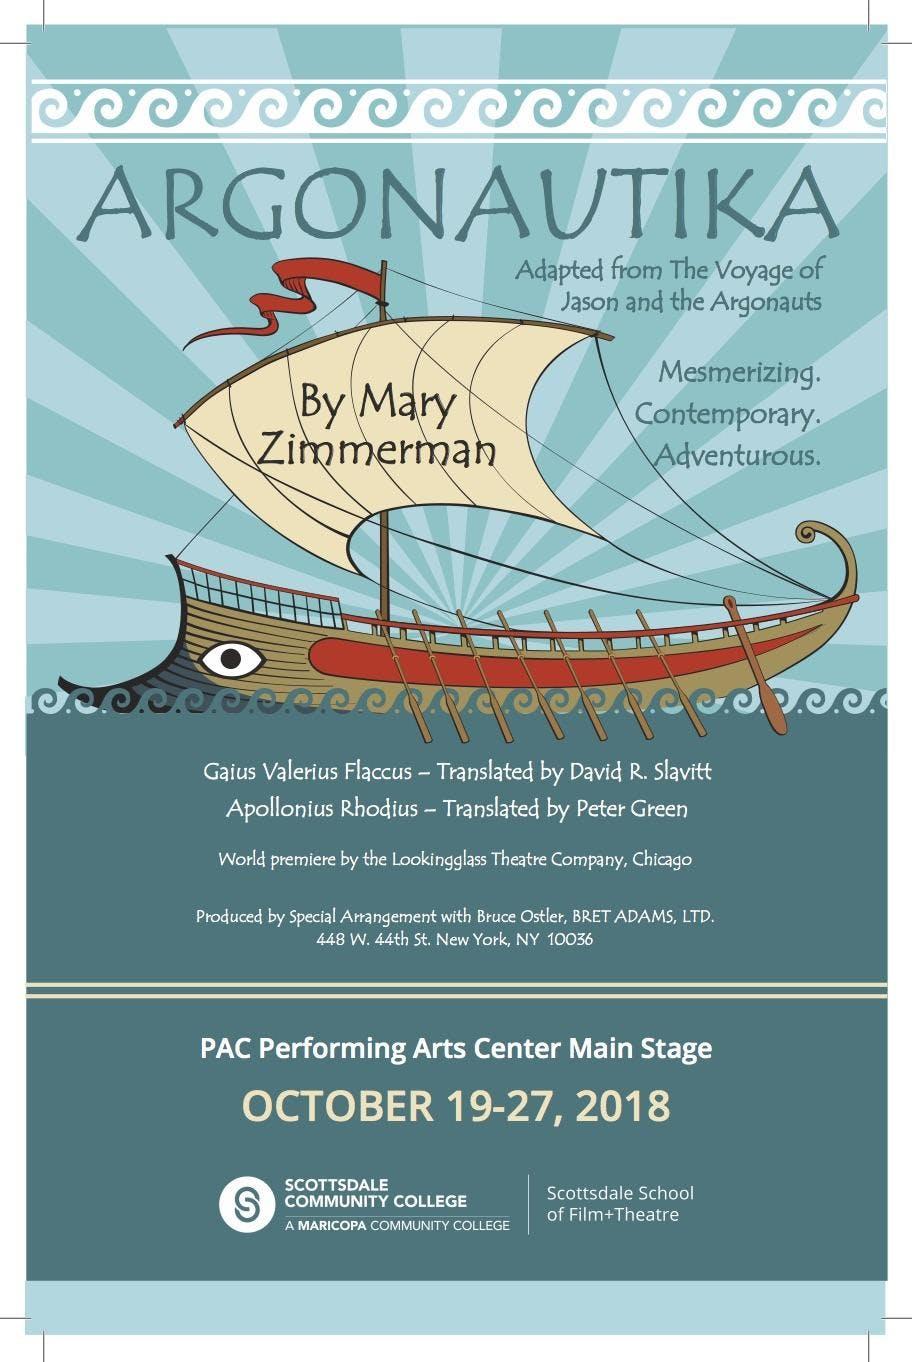 ARGONAUTIKA: The Voyage of Jason and the Argonauts by Mary Zimmerman